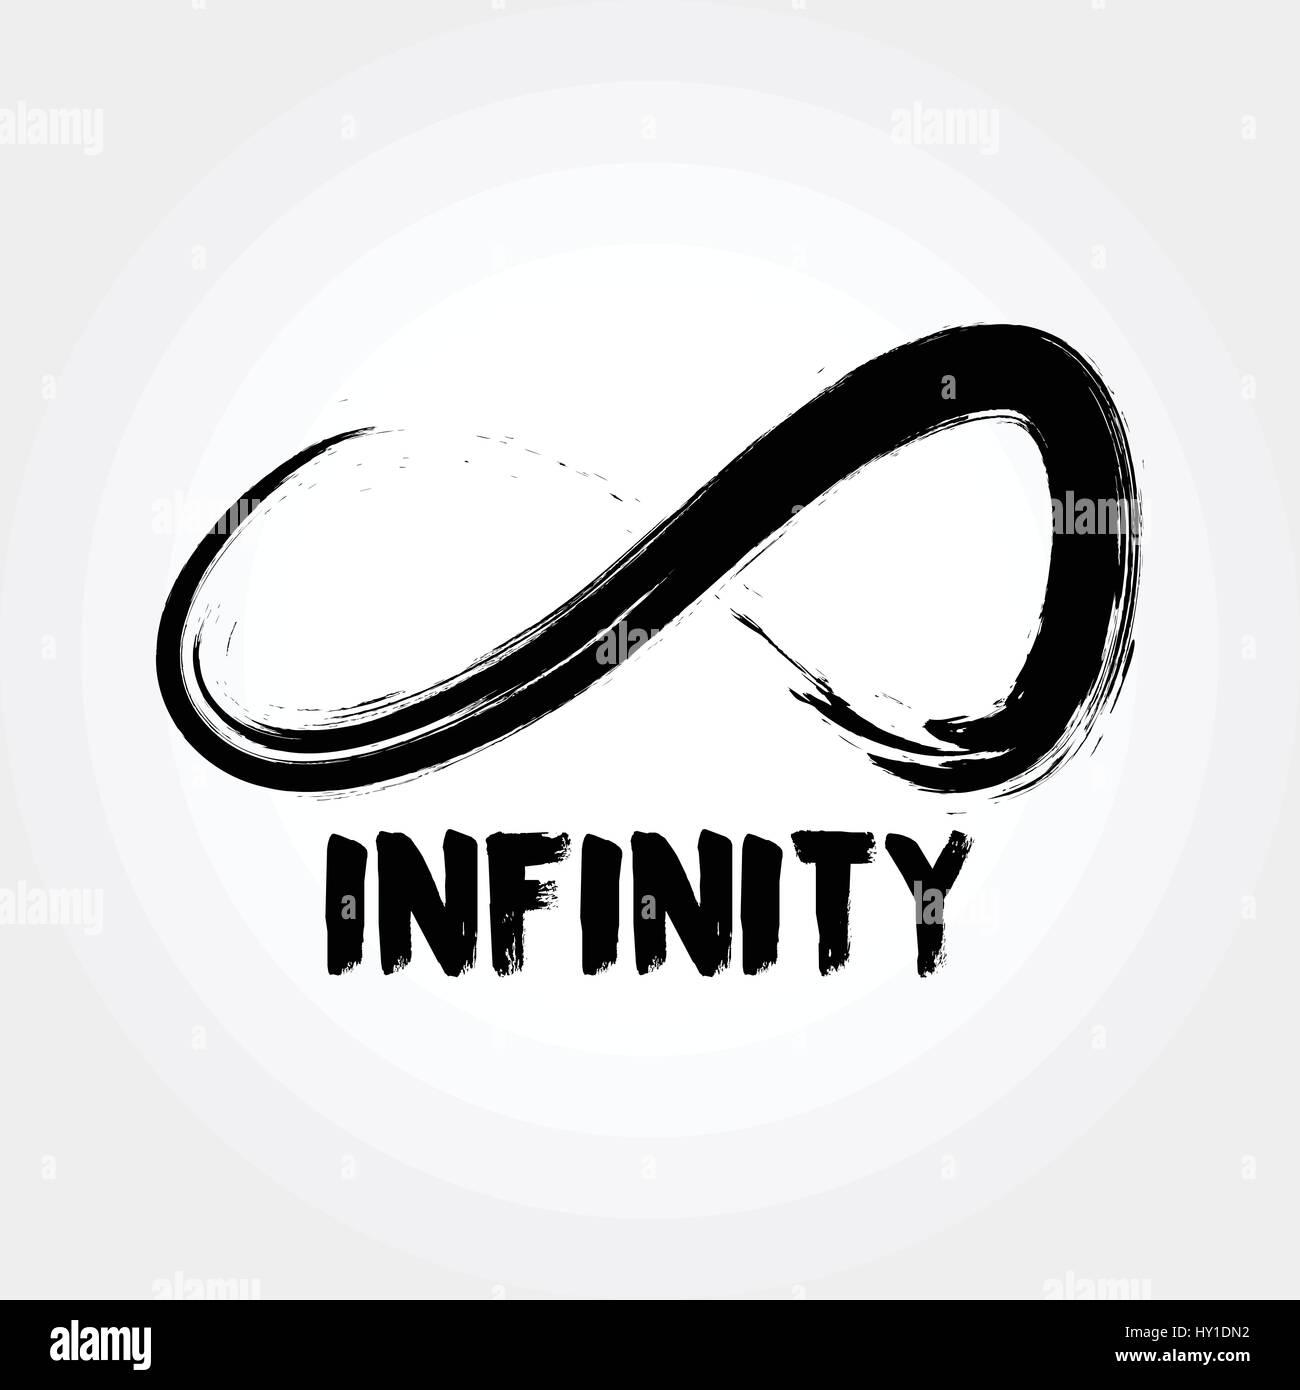 Grunge style infinity symbol stock vector art illustration grunge style infinity symbol biocorpaavc